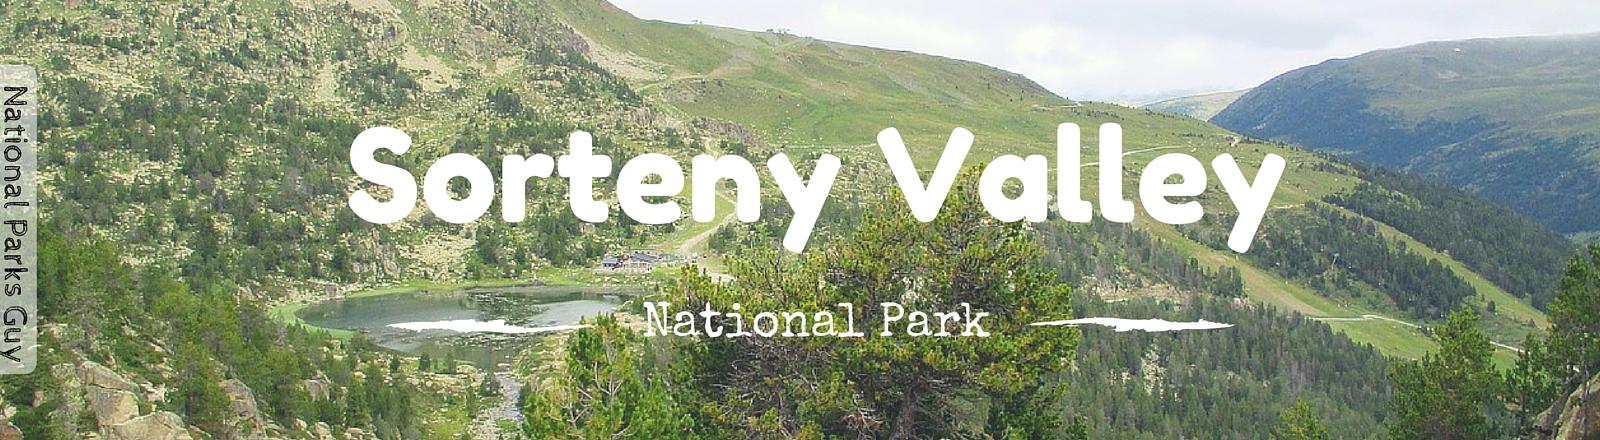 Sorteny Valley Nature Park, Andorra, National Parks Guy